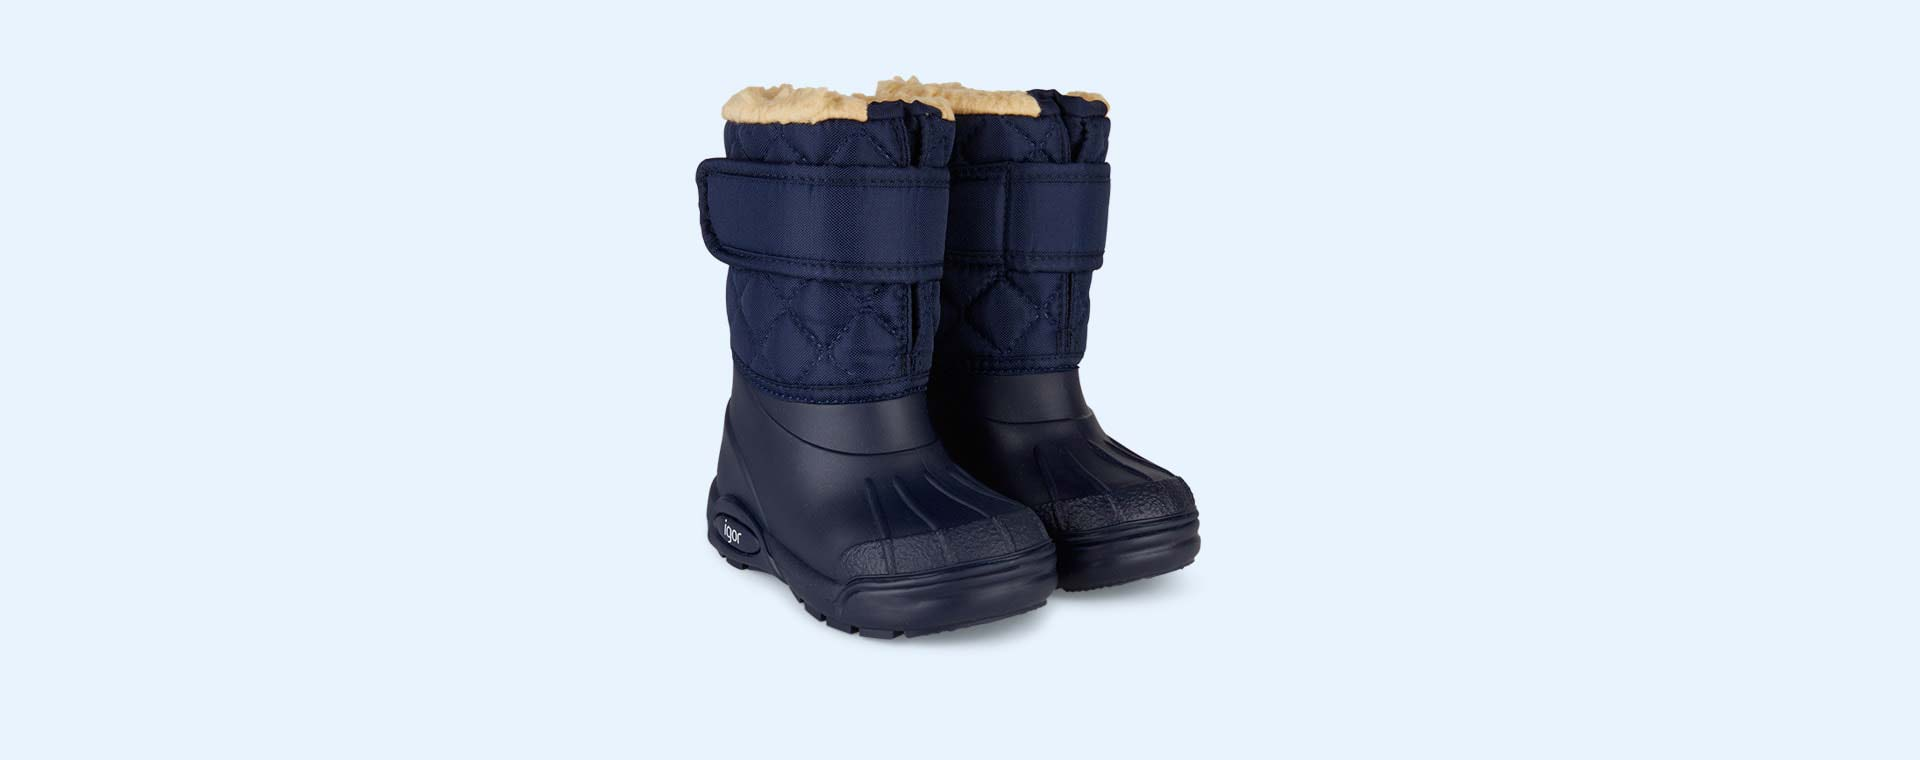 Navy igor Fur Lined Topo Ski Boot